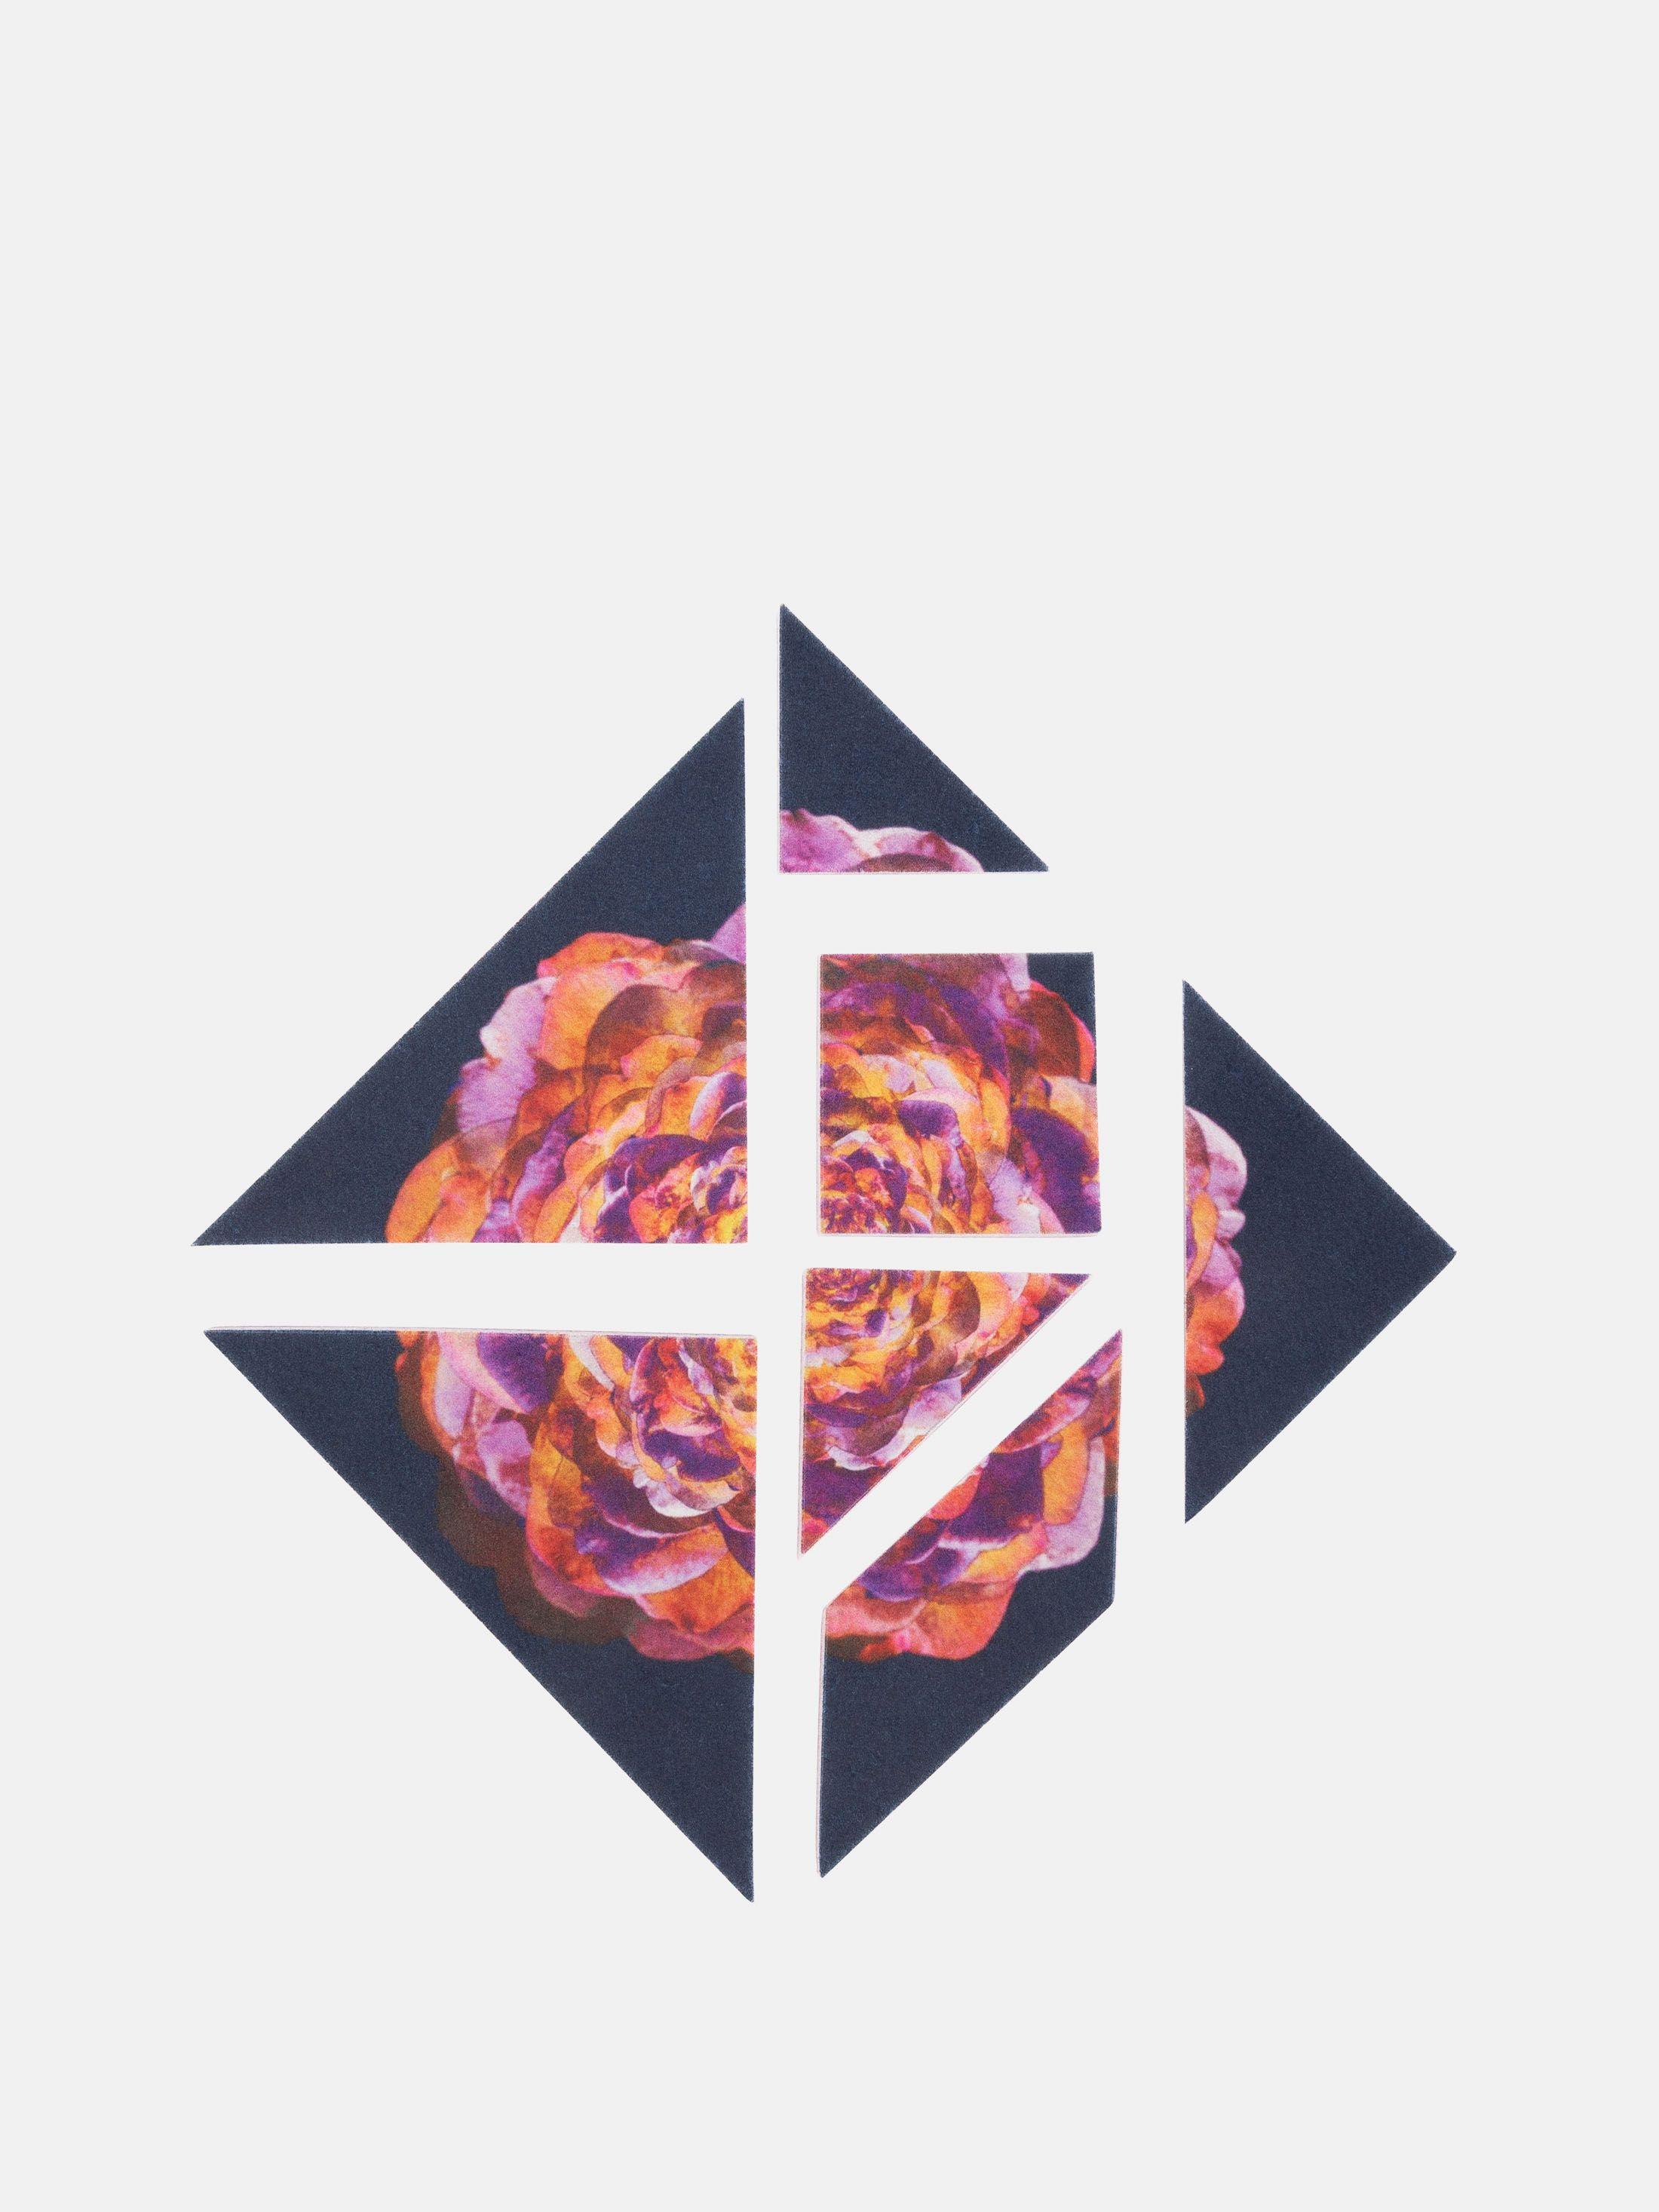 Tangram puzzles online using artwork